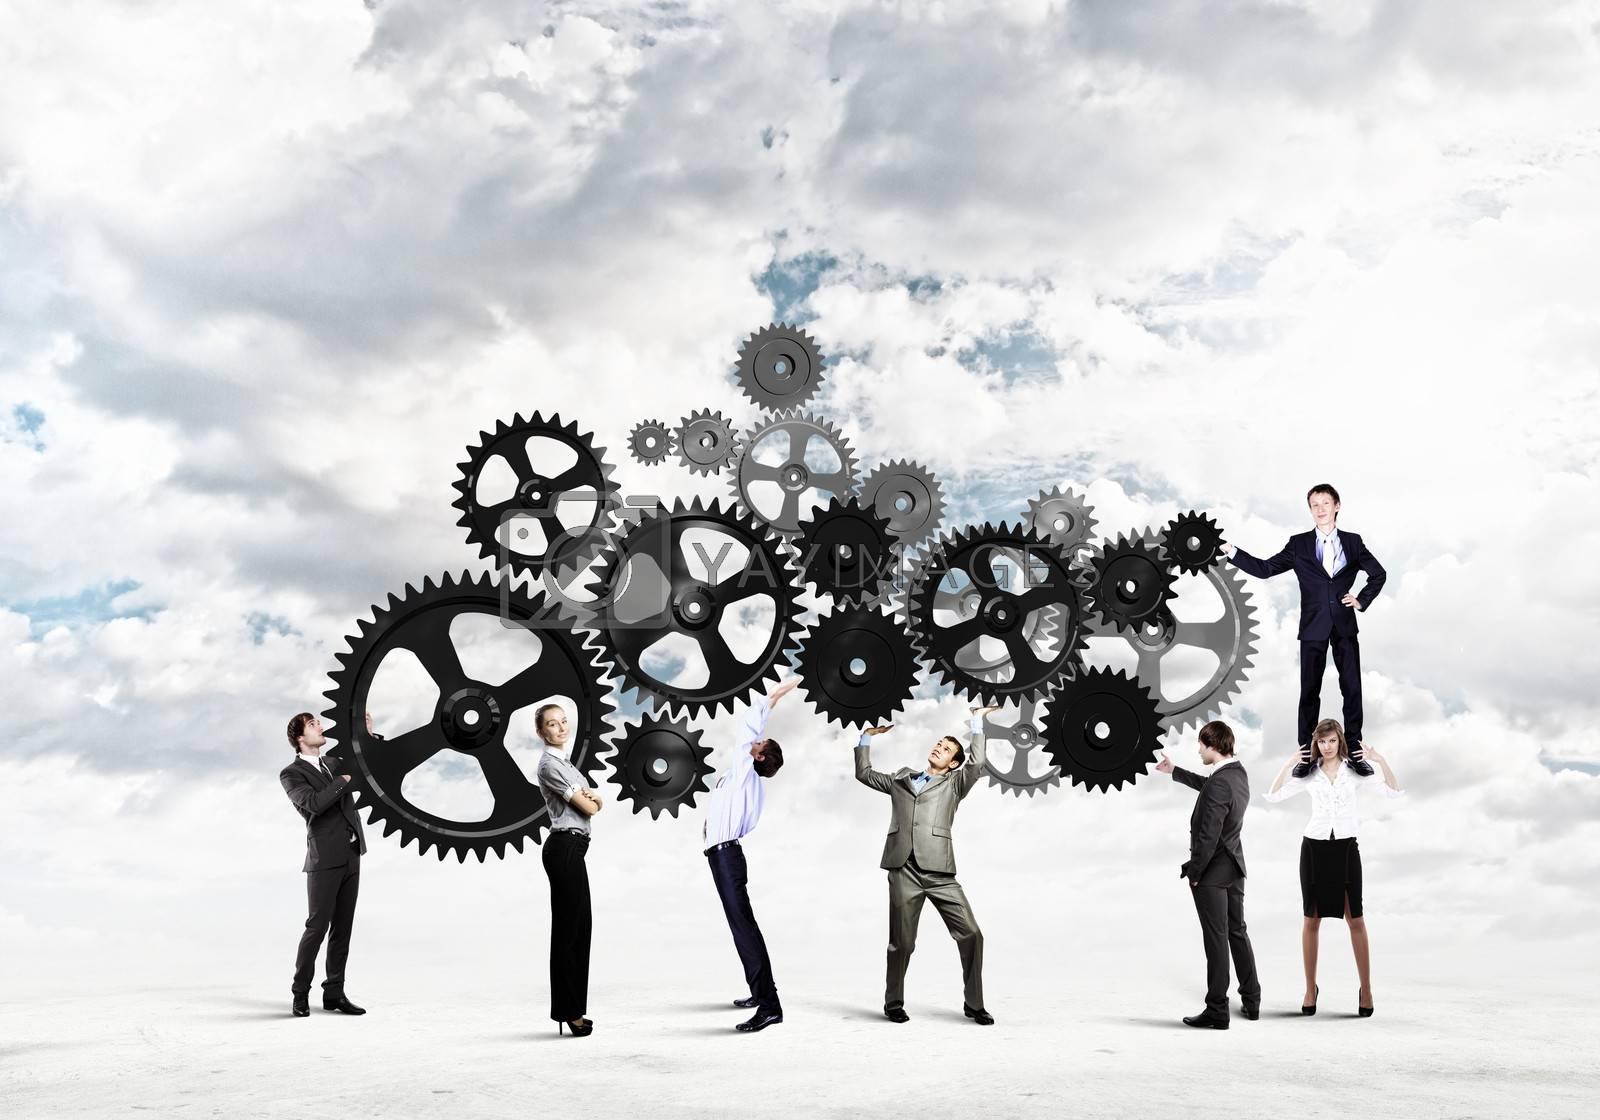 Teamwork concept by Sergey Nivens